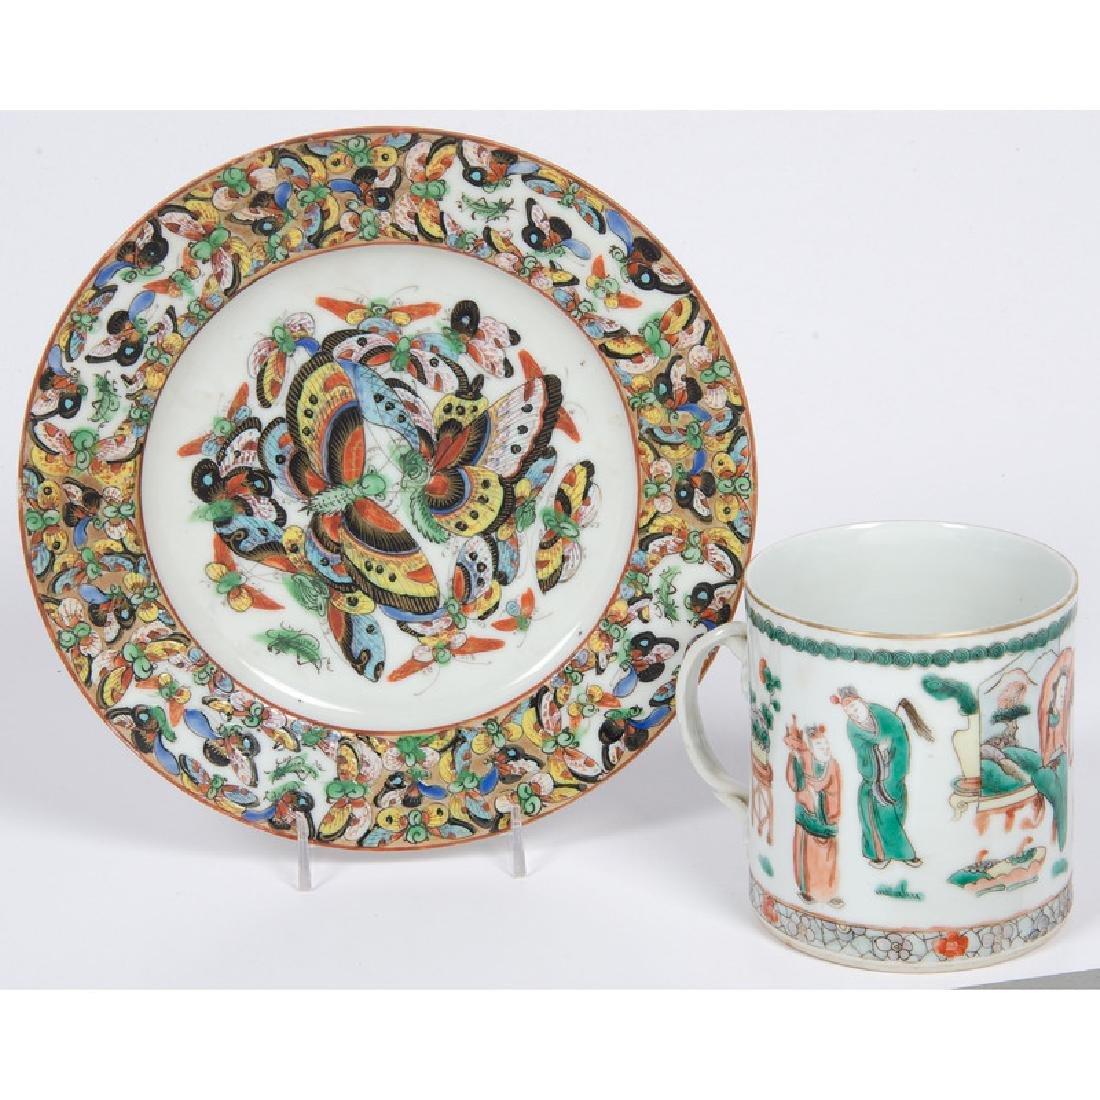 Chinese Export Mug and Plate